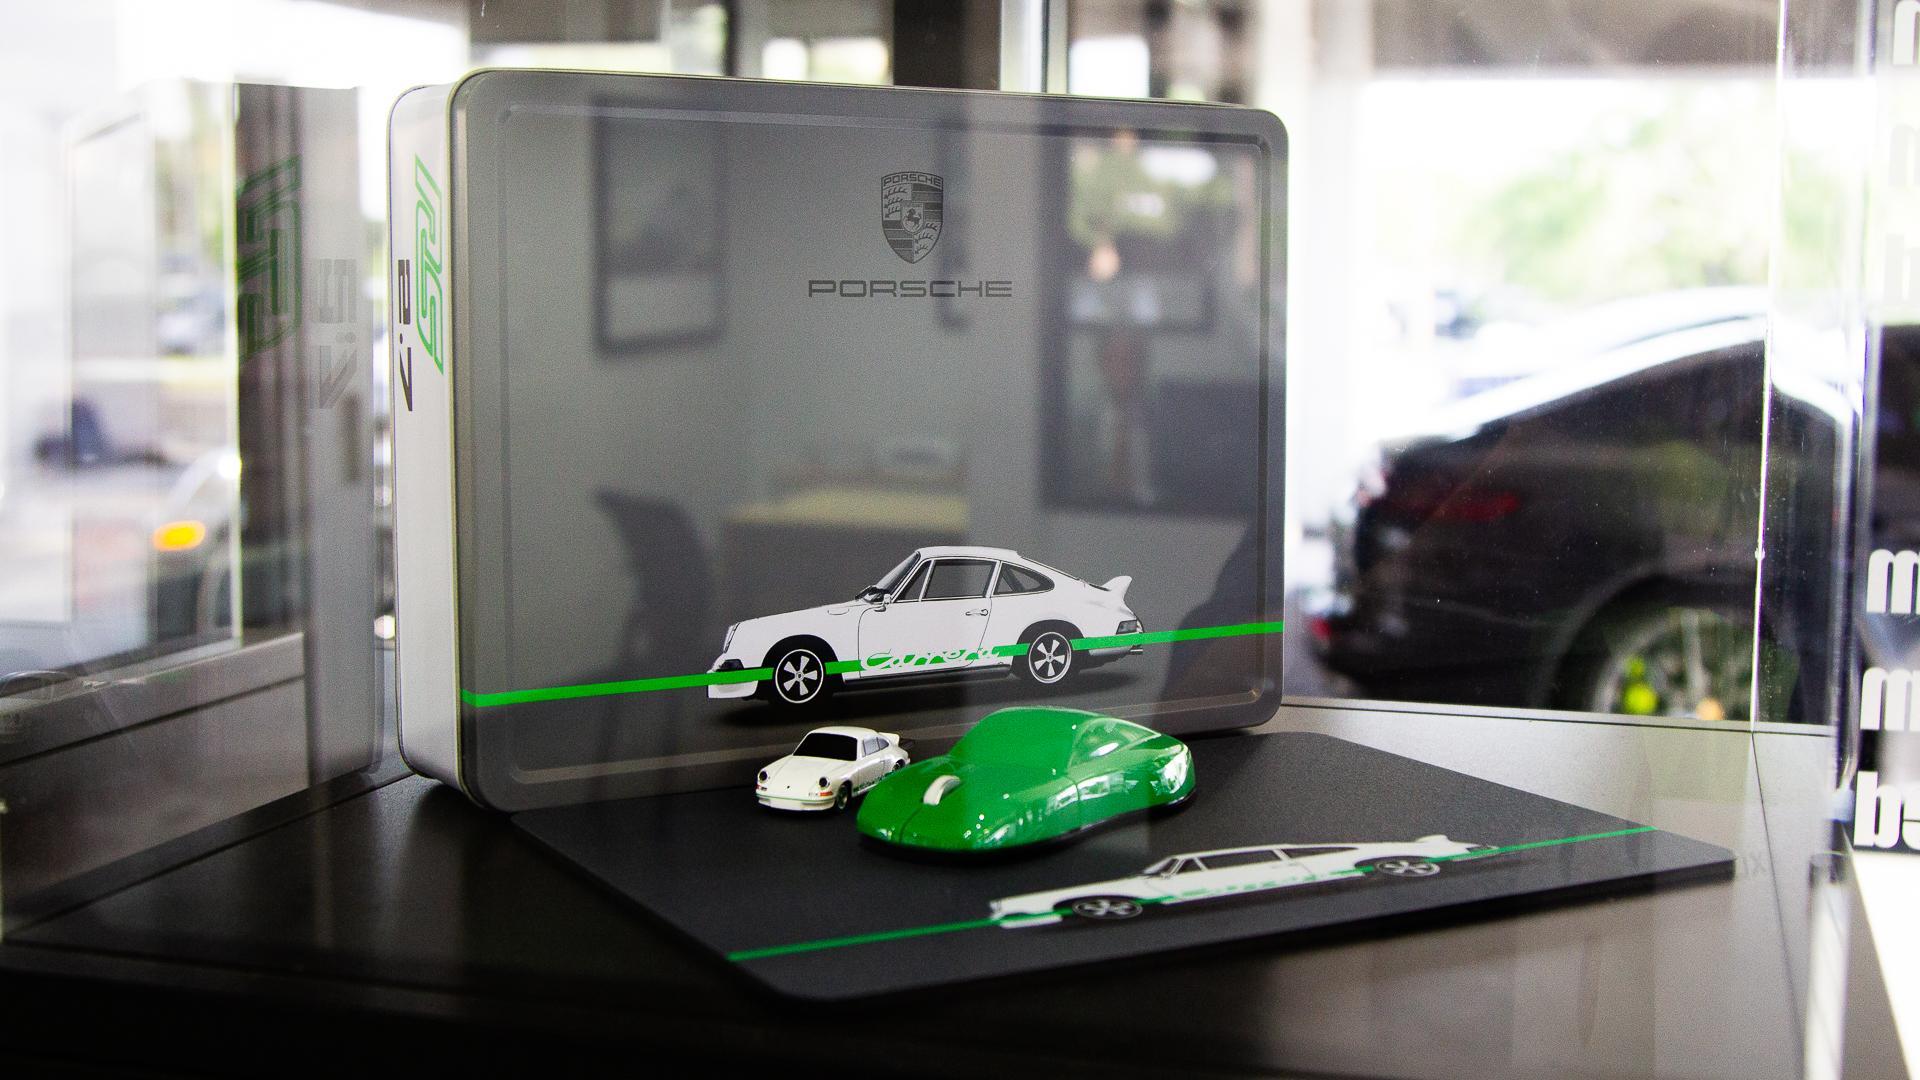 Porsche-Austin-2018-Panamera-22.jpg